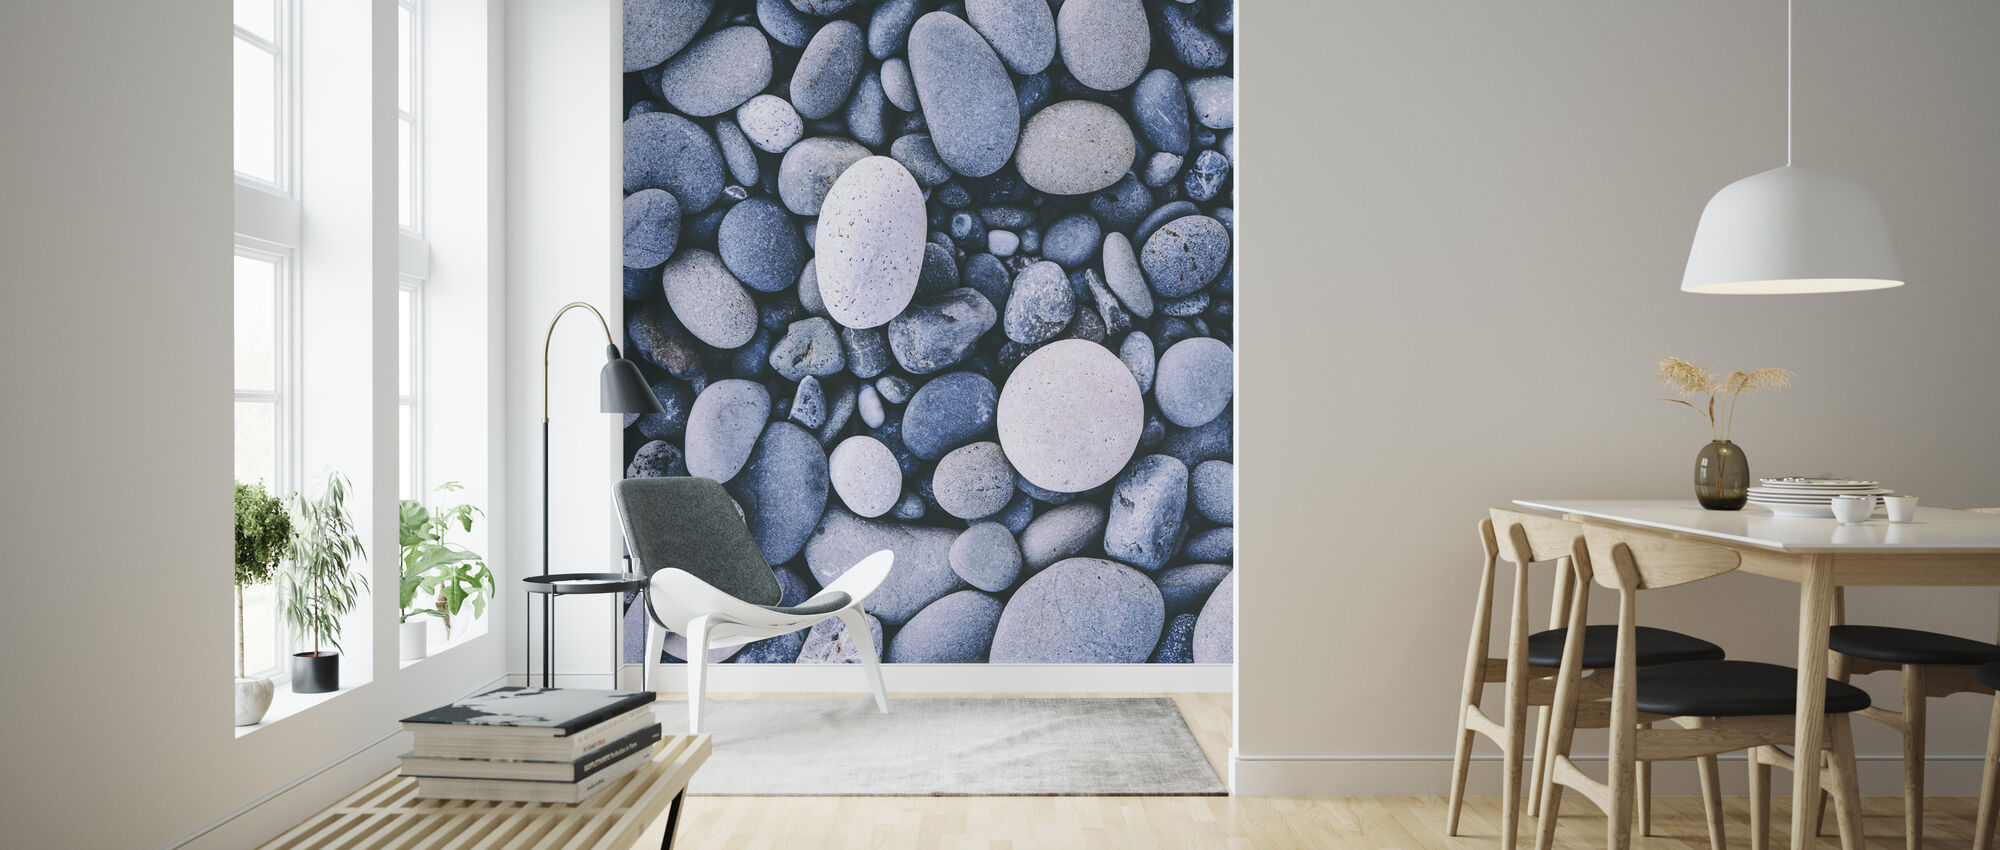 Smooth Pebbles - Wallpaper - Living Room